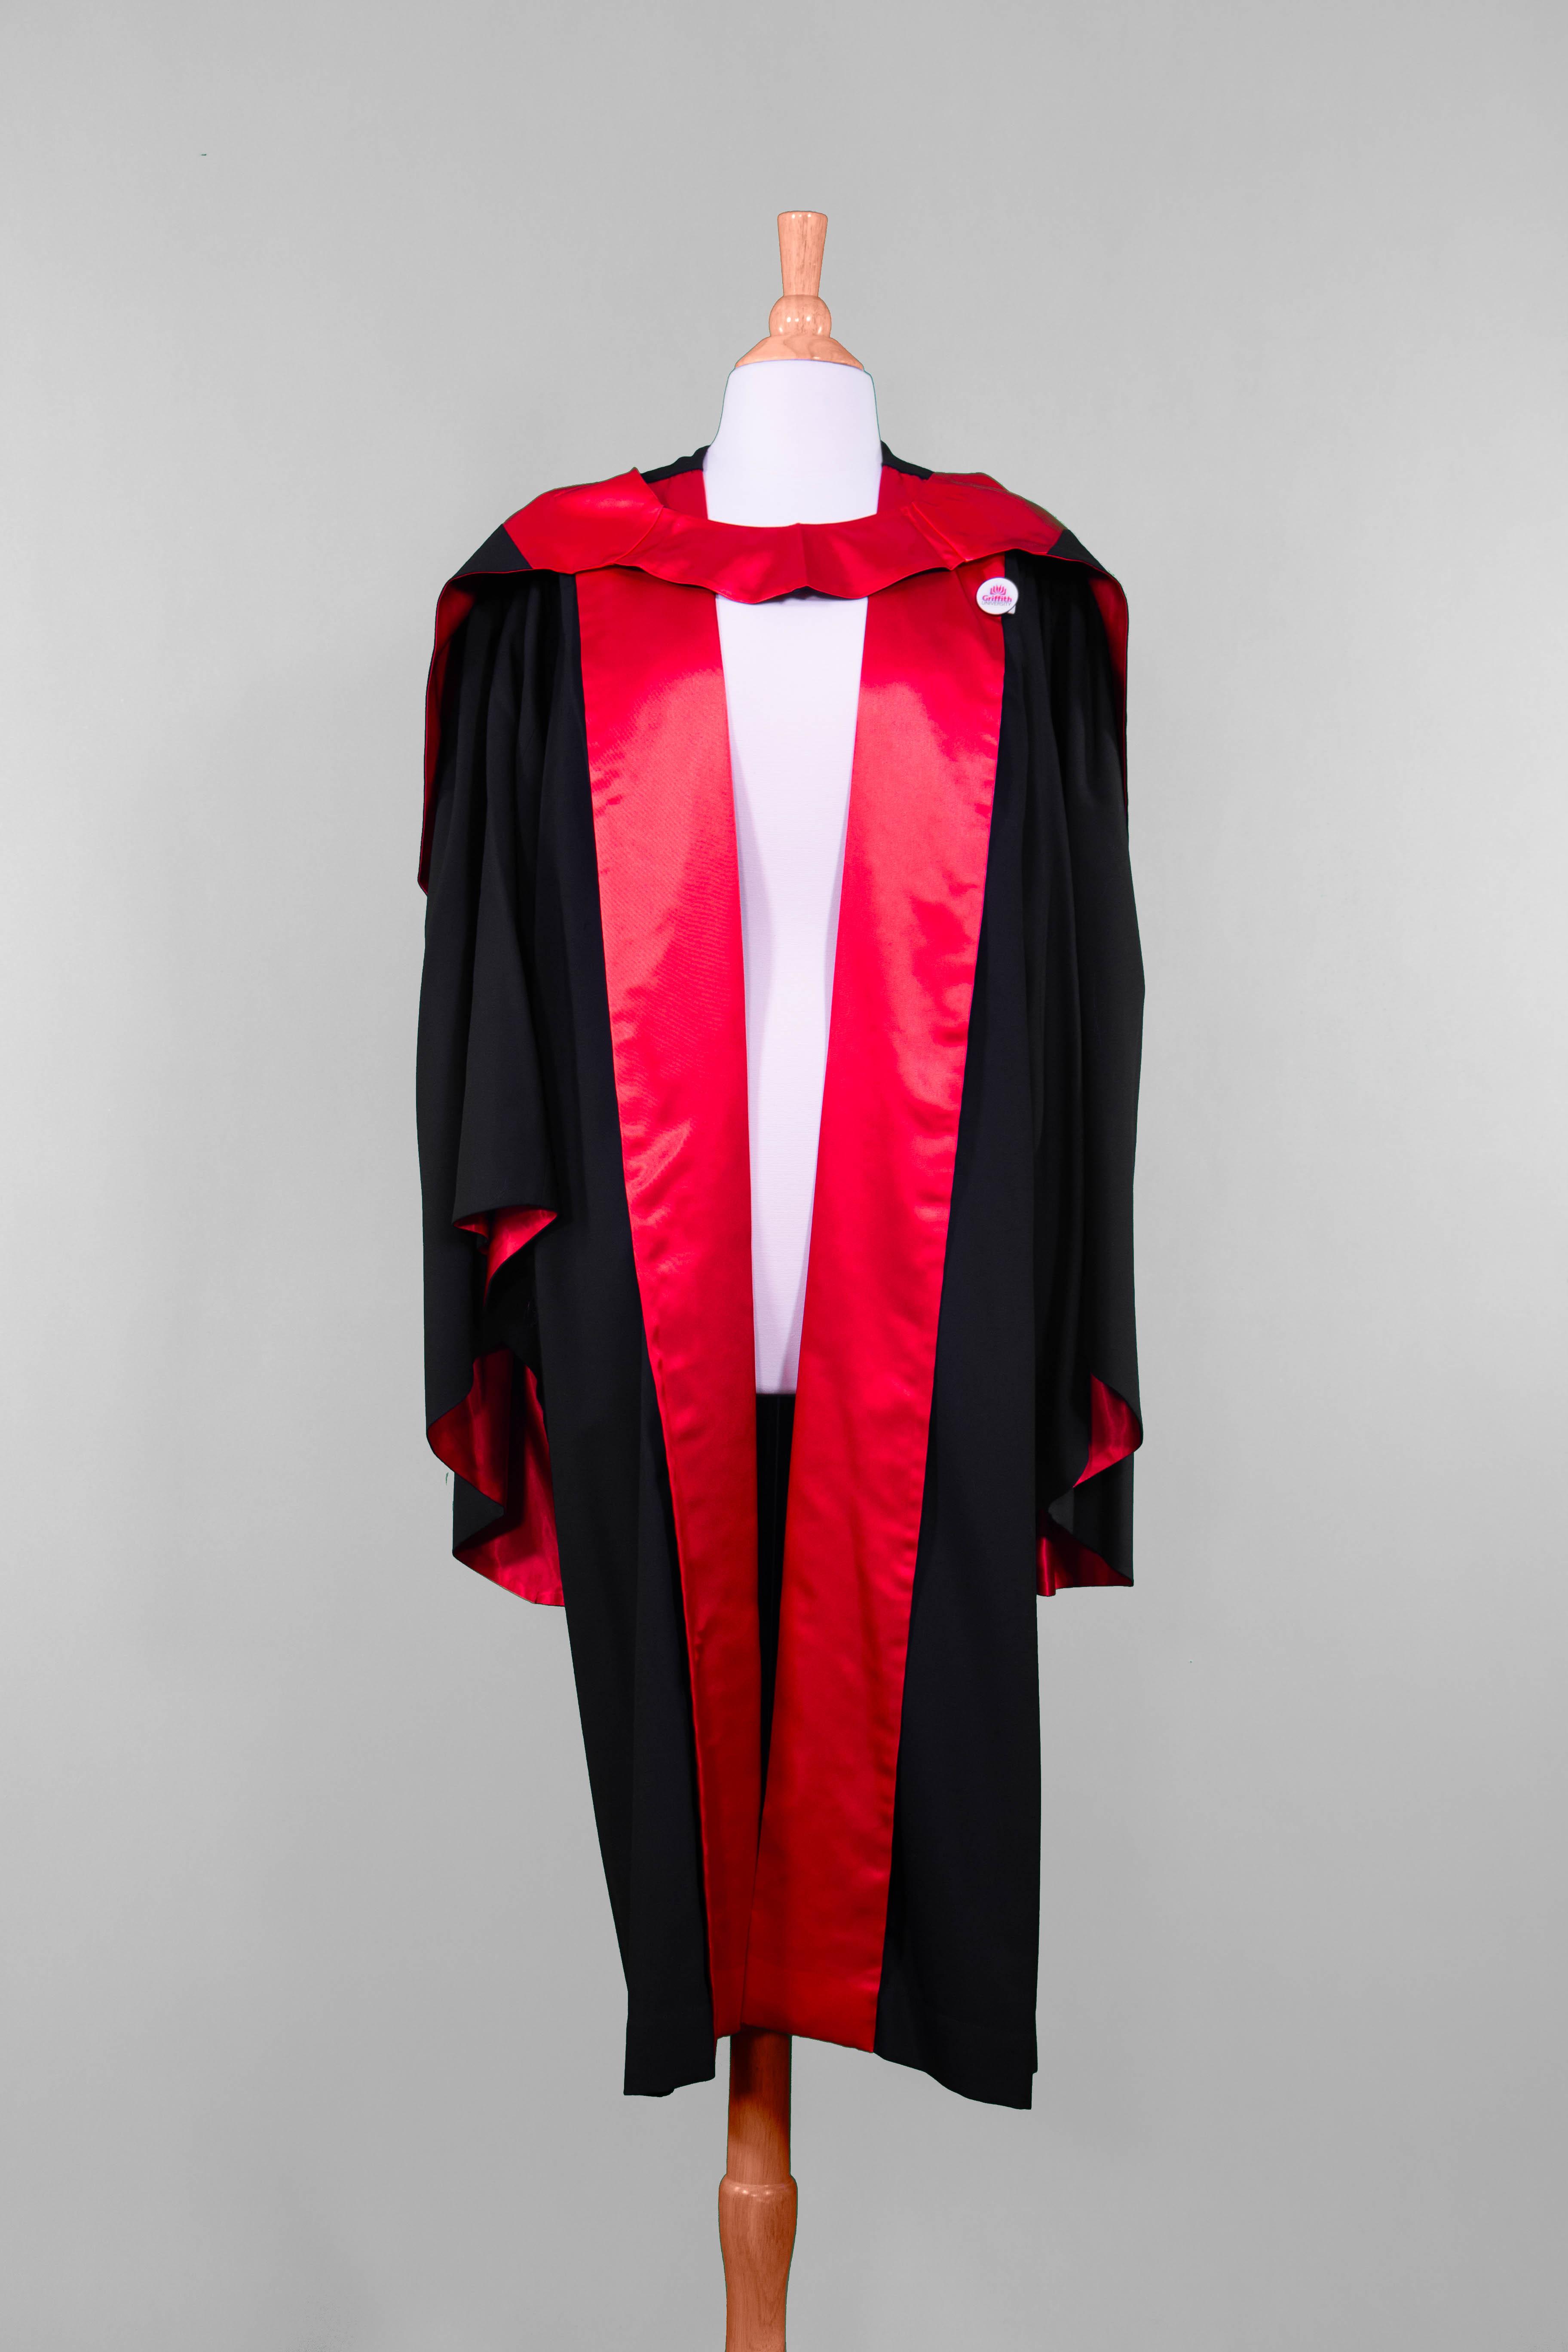 Academic dress